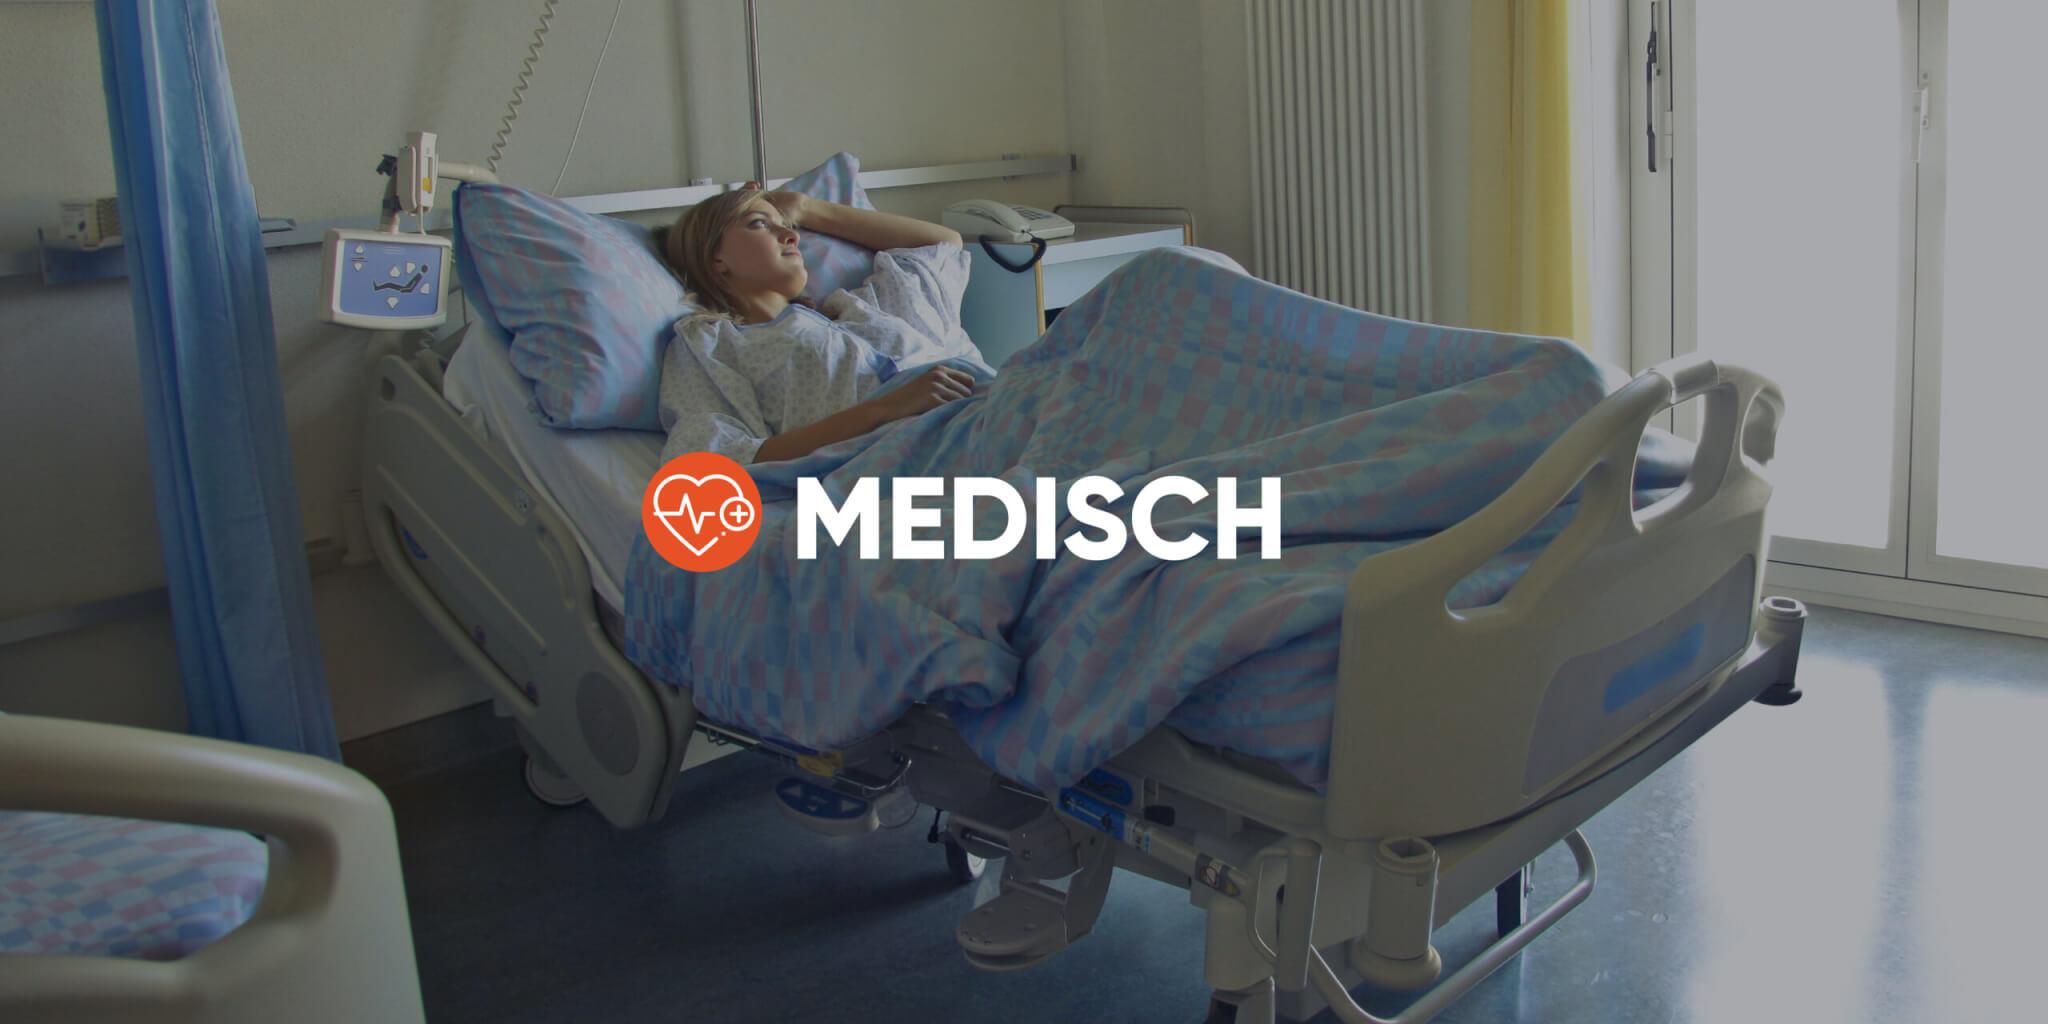 Sport Herzog Medical Trailrunning